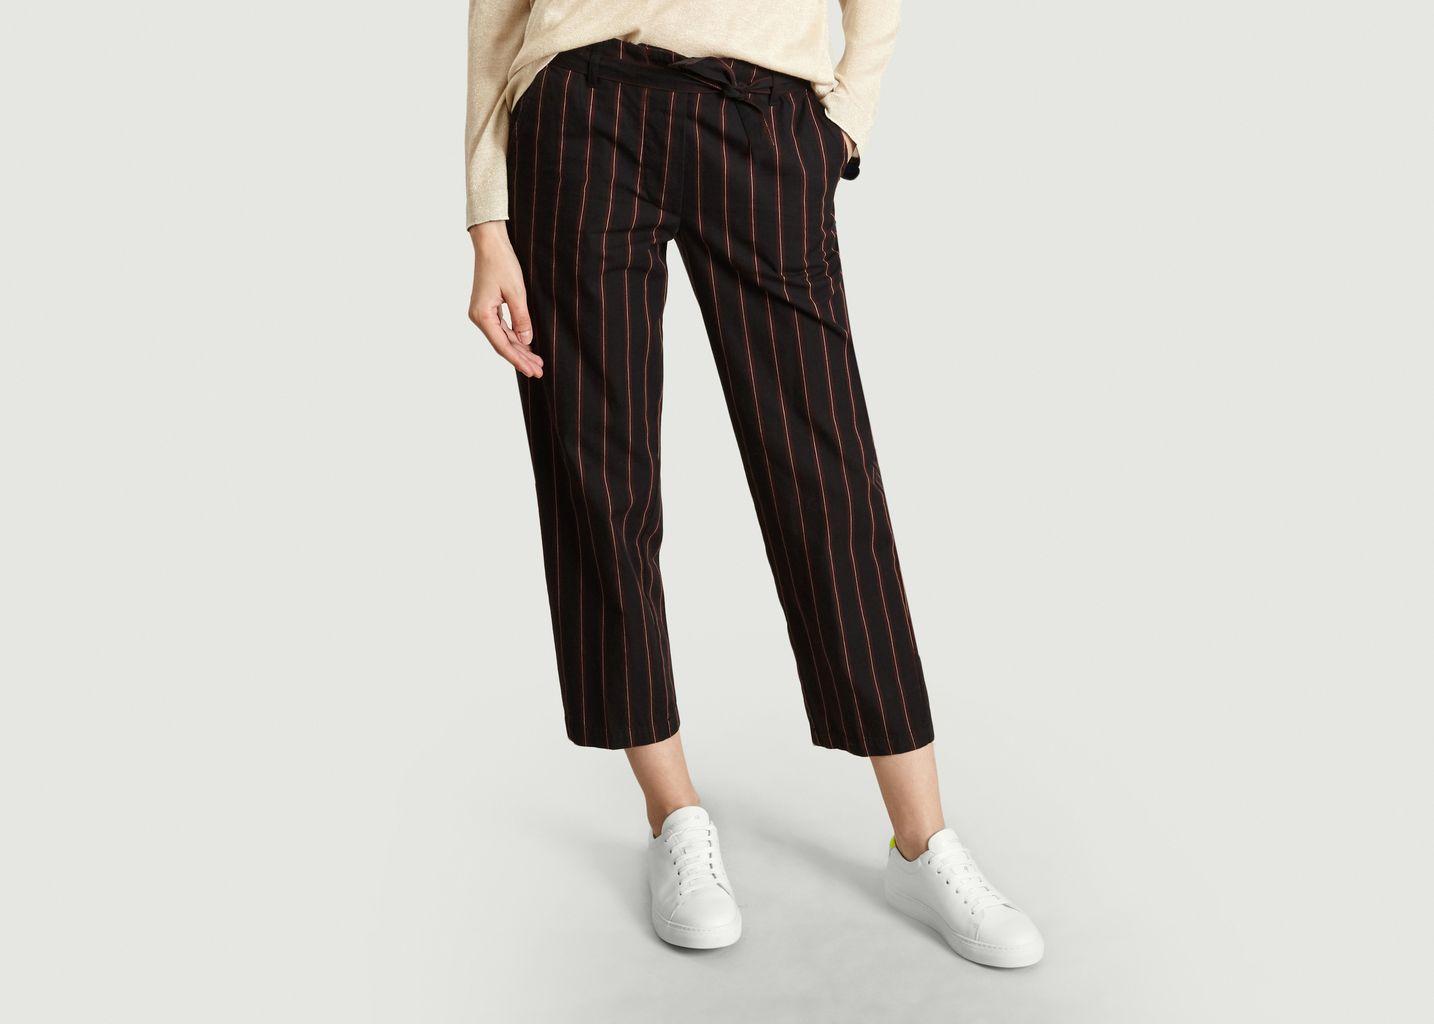 Pantalon Rayé Ceinturé 7/8e Lou - Bellerose